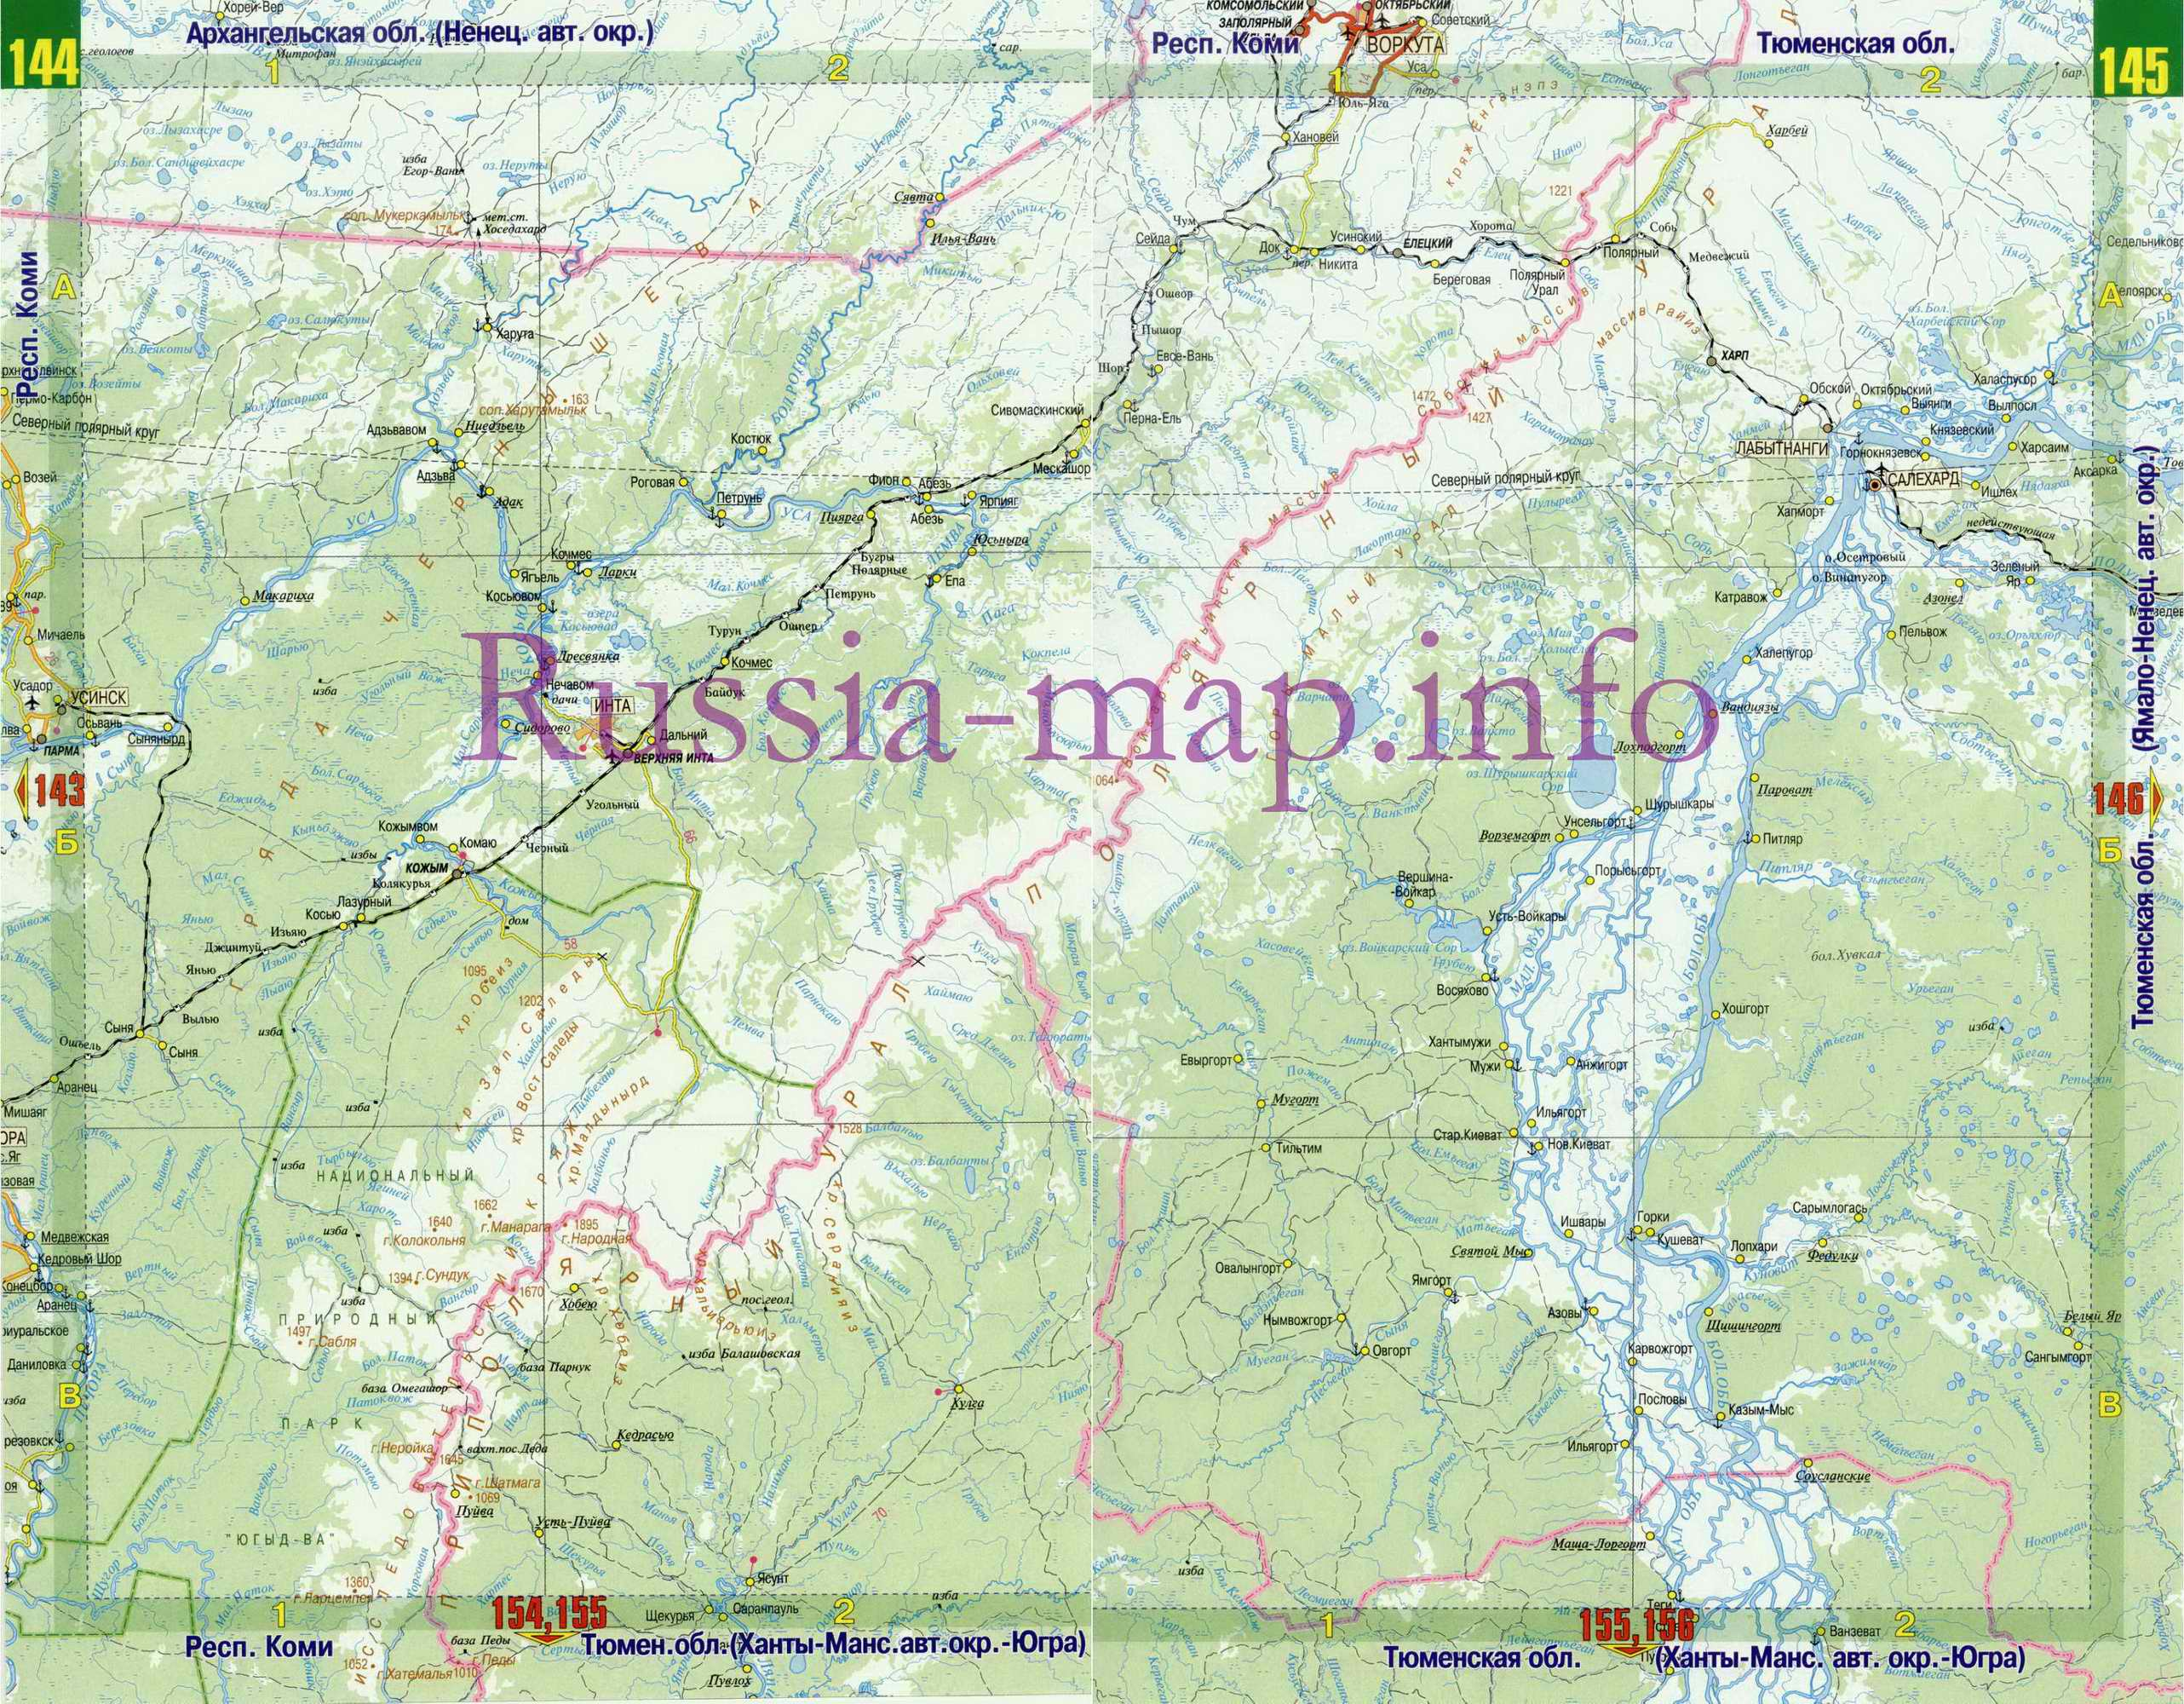 Карта дорог Коми. Карта автодорог республики Коми, A0: http://euro-atlas.ru/map1101646_0_0.htm